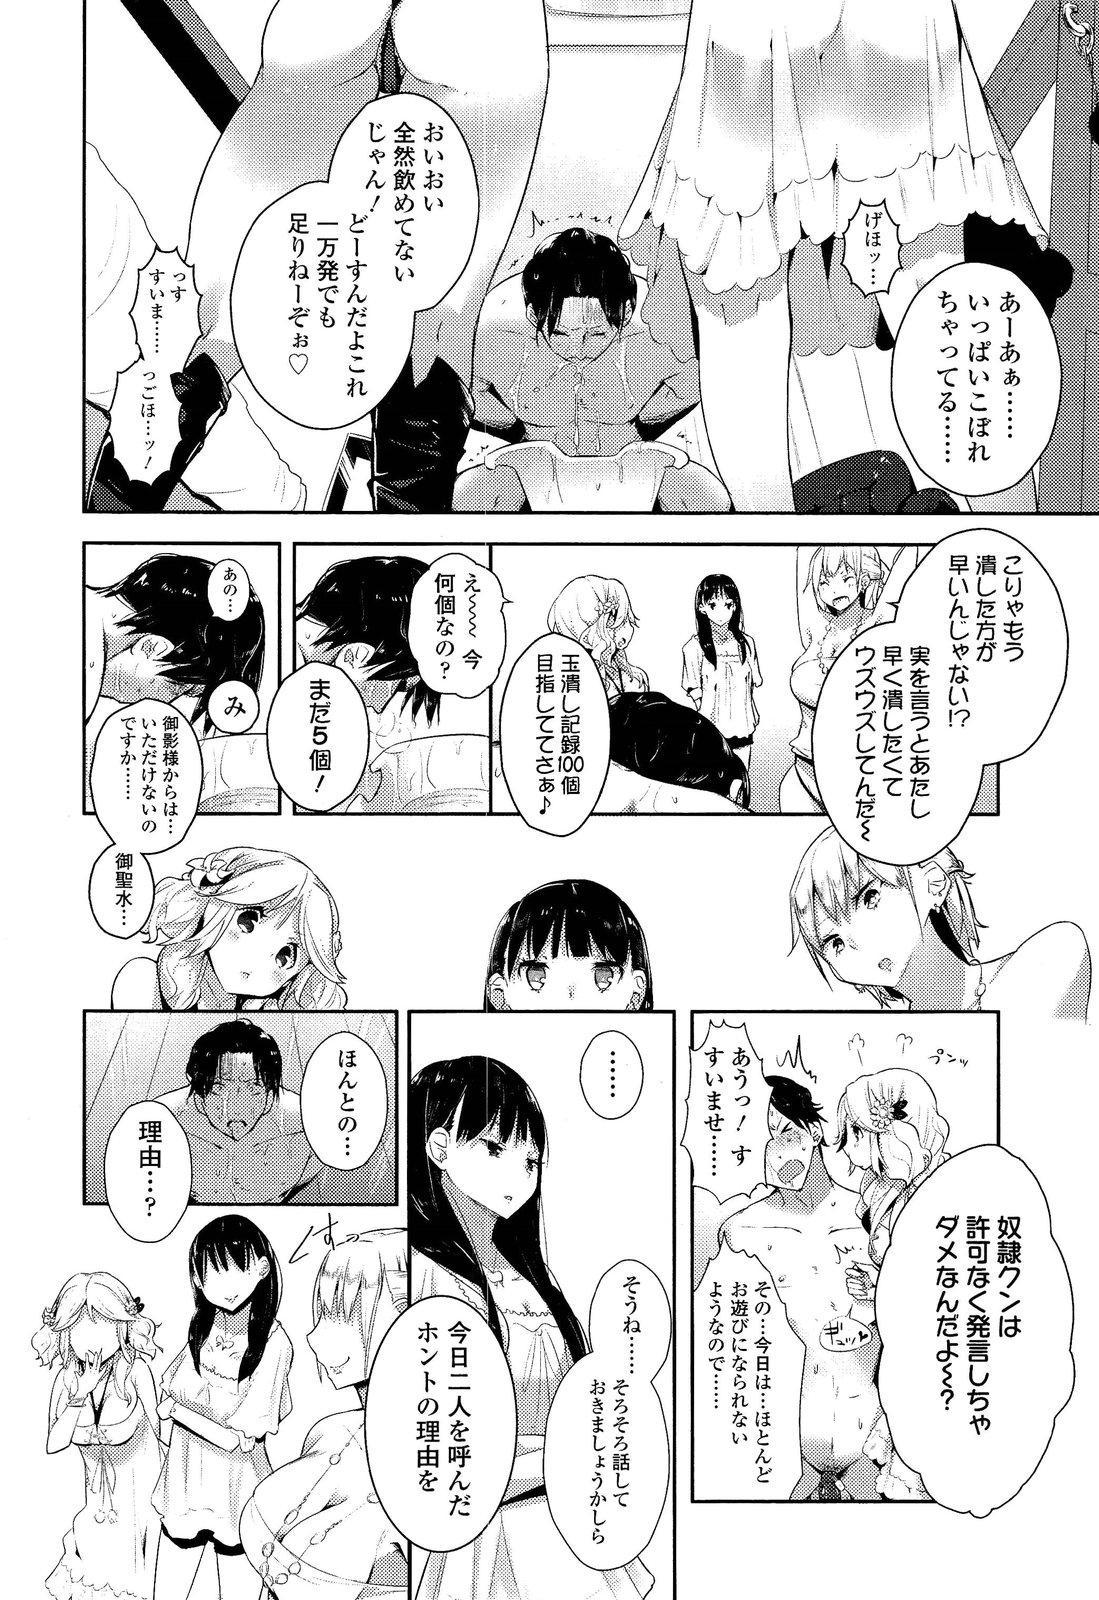 Girls forM Vol. 02 49